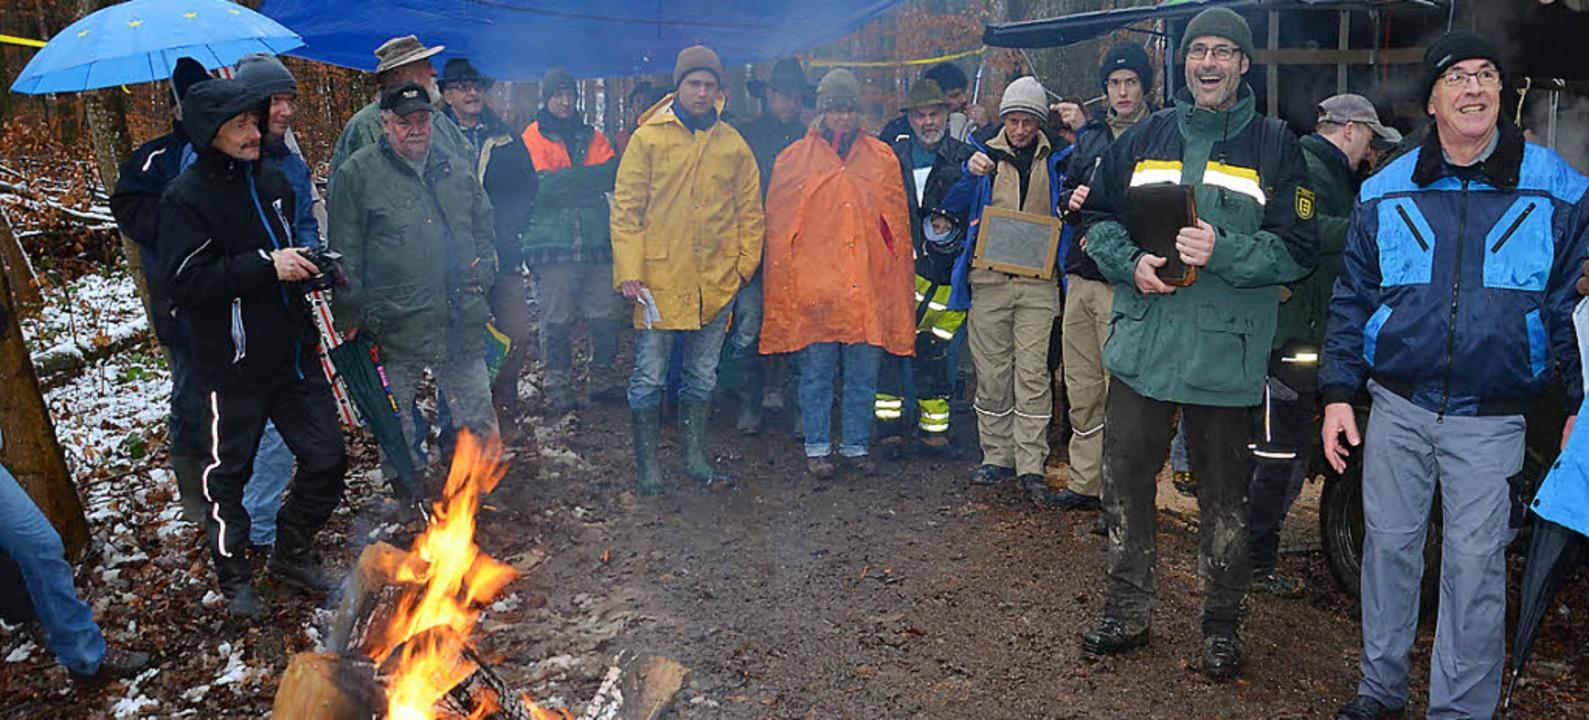 Gute Laune am Feuer trotz schlechter W...e Interesse an der Holzversteigerung.     Foto: Schopferer